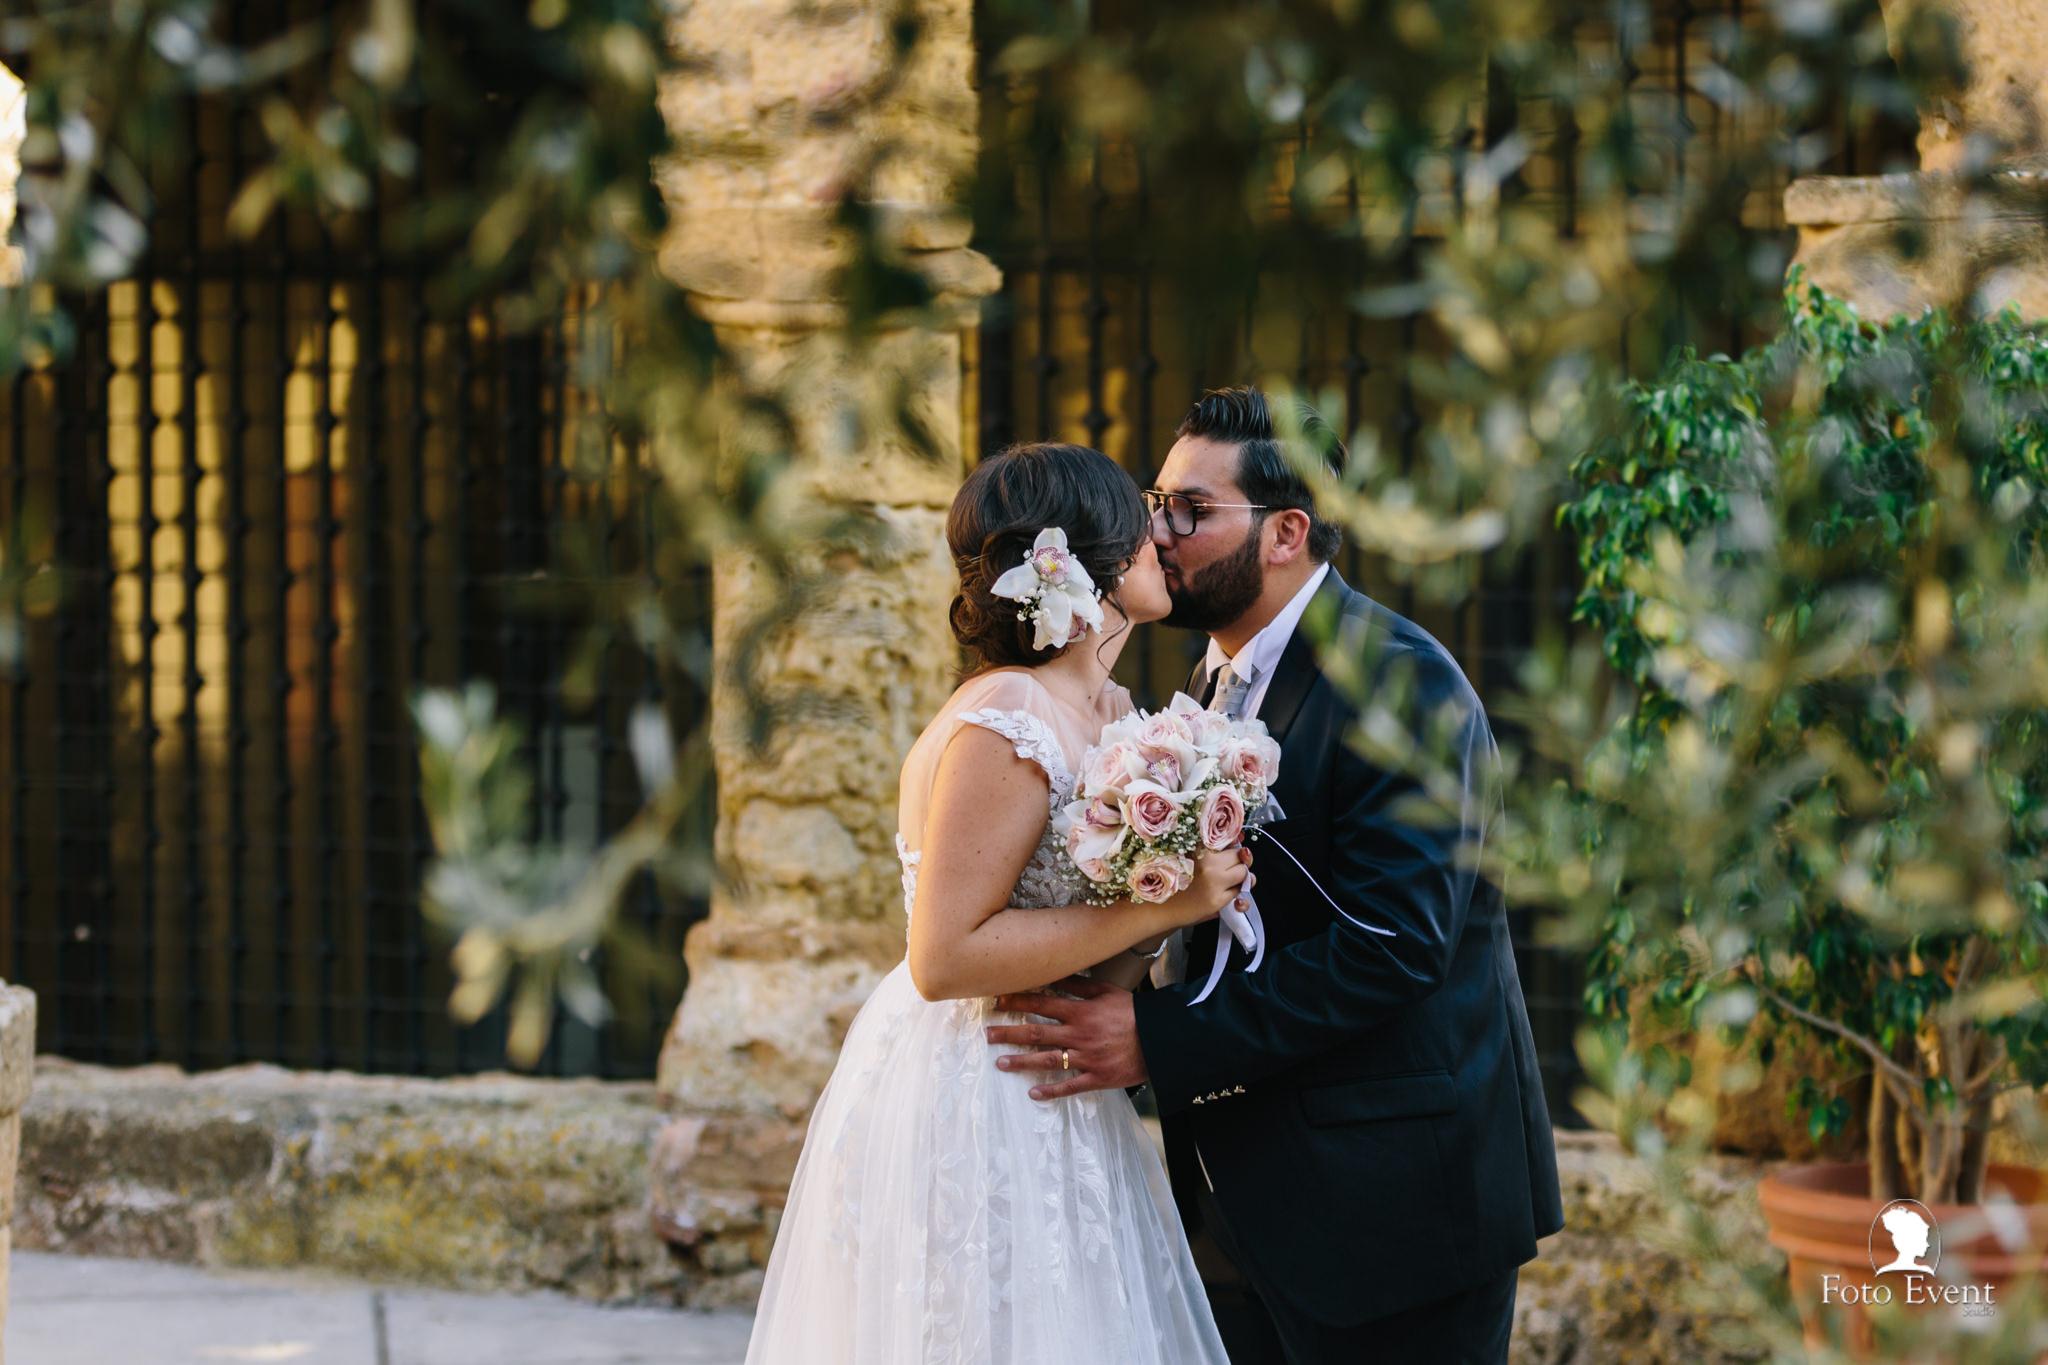 030-2019-09-09-Matrimonio-Dorotea-e-Alberto-Iemmolo-zoom-439